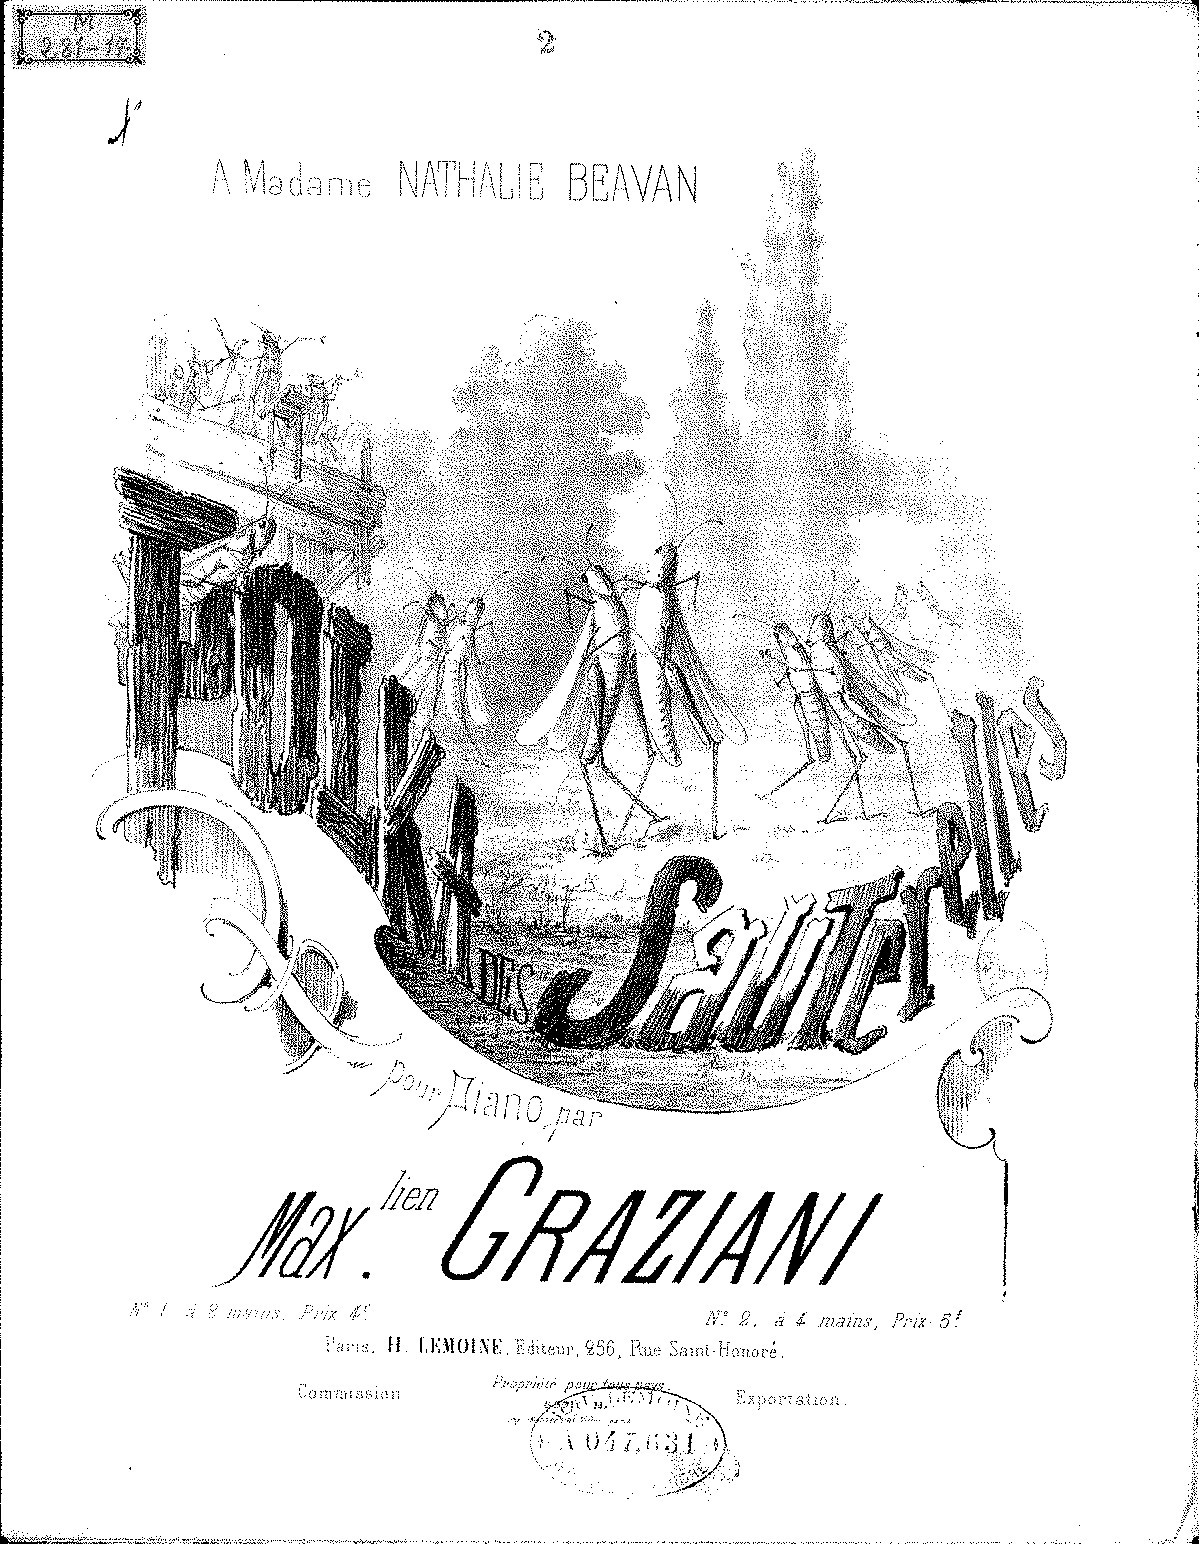 Polka des sauterelles (Graziani, Maximilien) - IMSLP